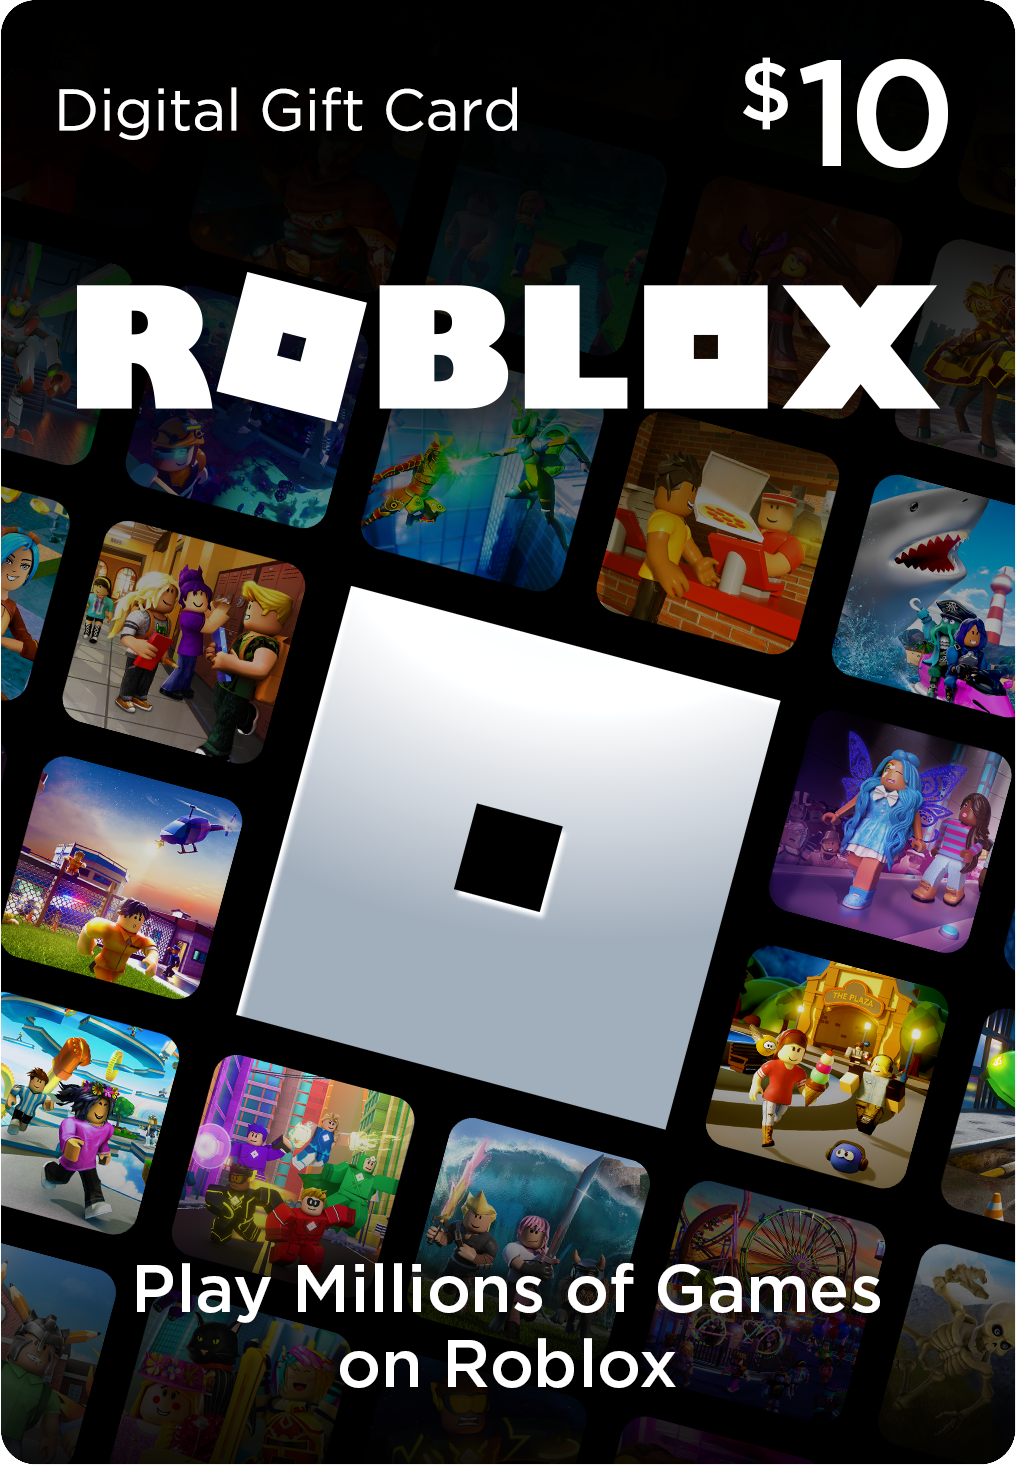 Roblox 10 Digital Gift Card Includes Exclusive Virtual Item Digital Download Walmart Com In 2021 Roblox Gifts Xbox Gift Card Gift Card Generator